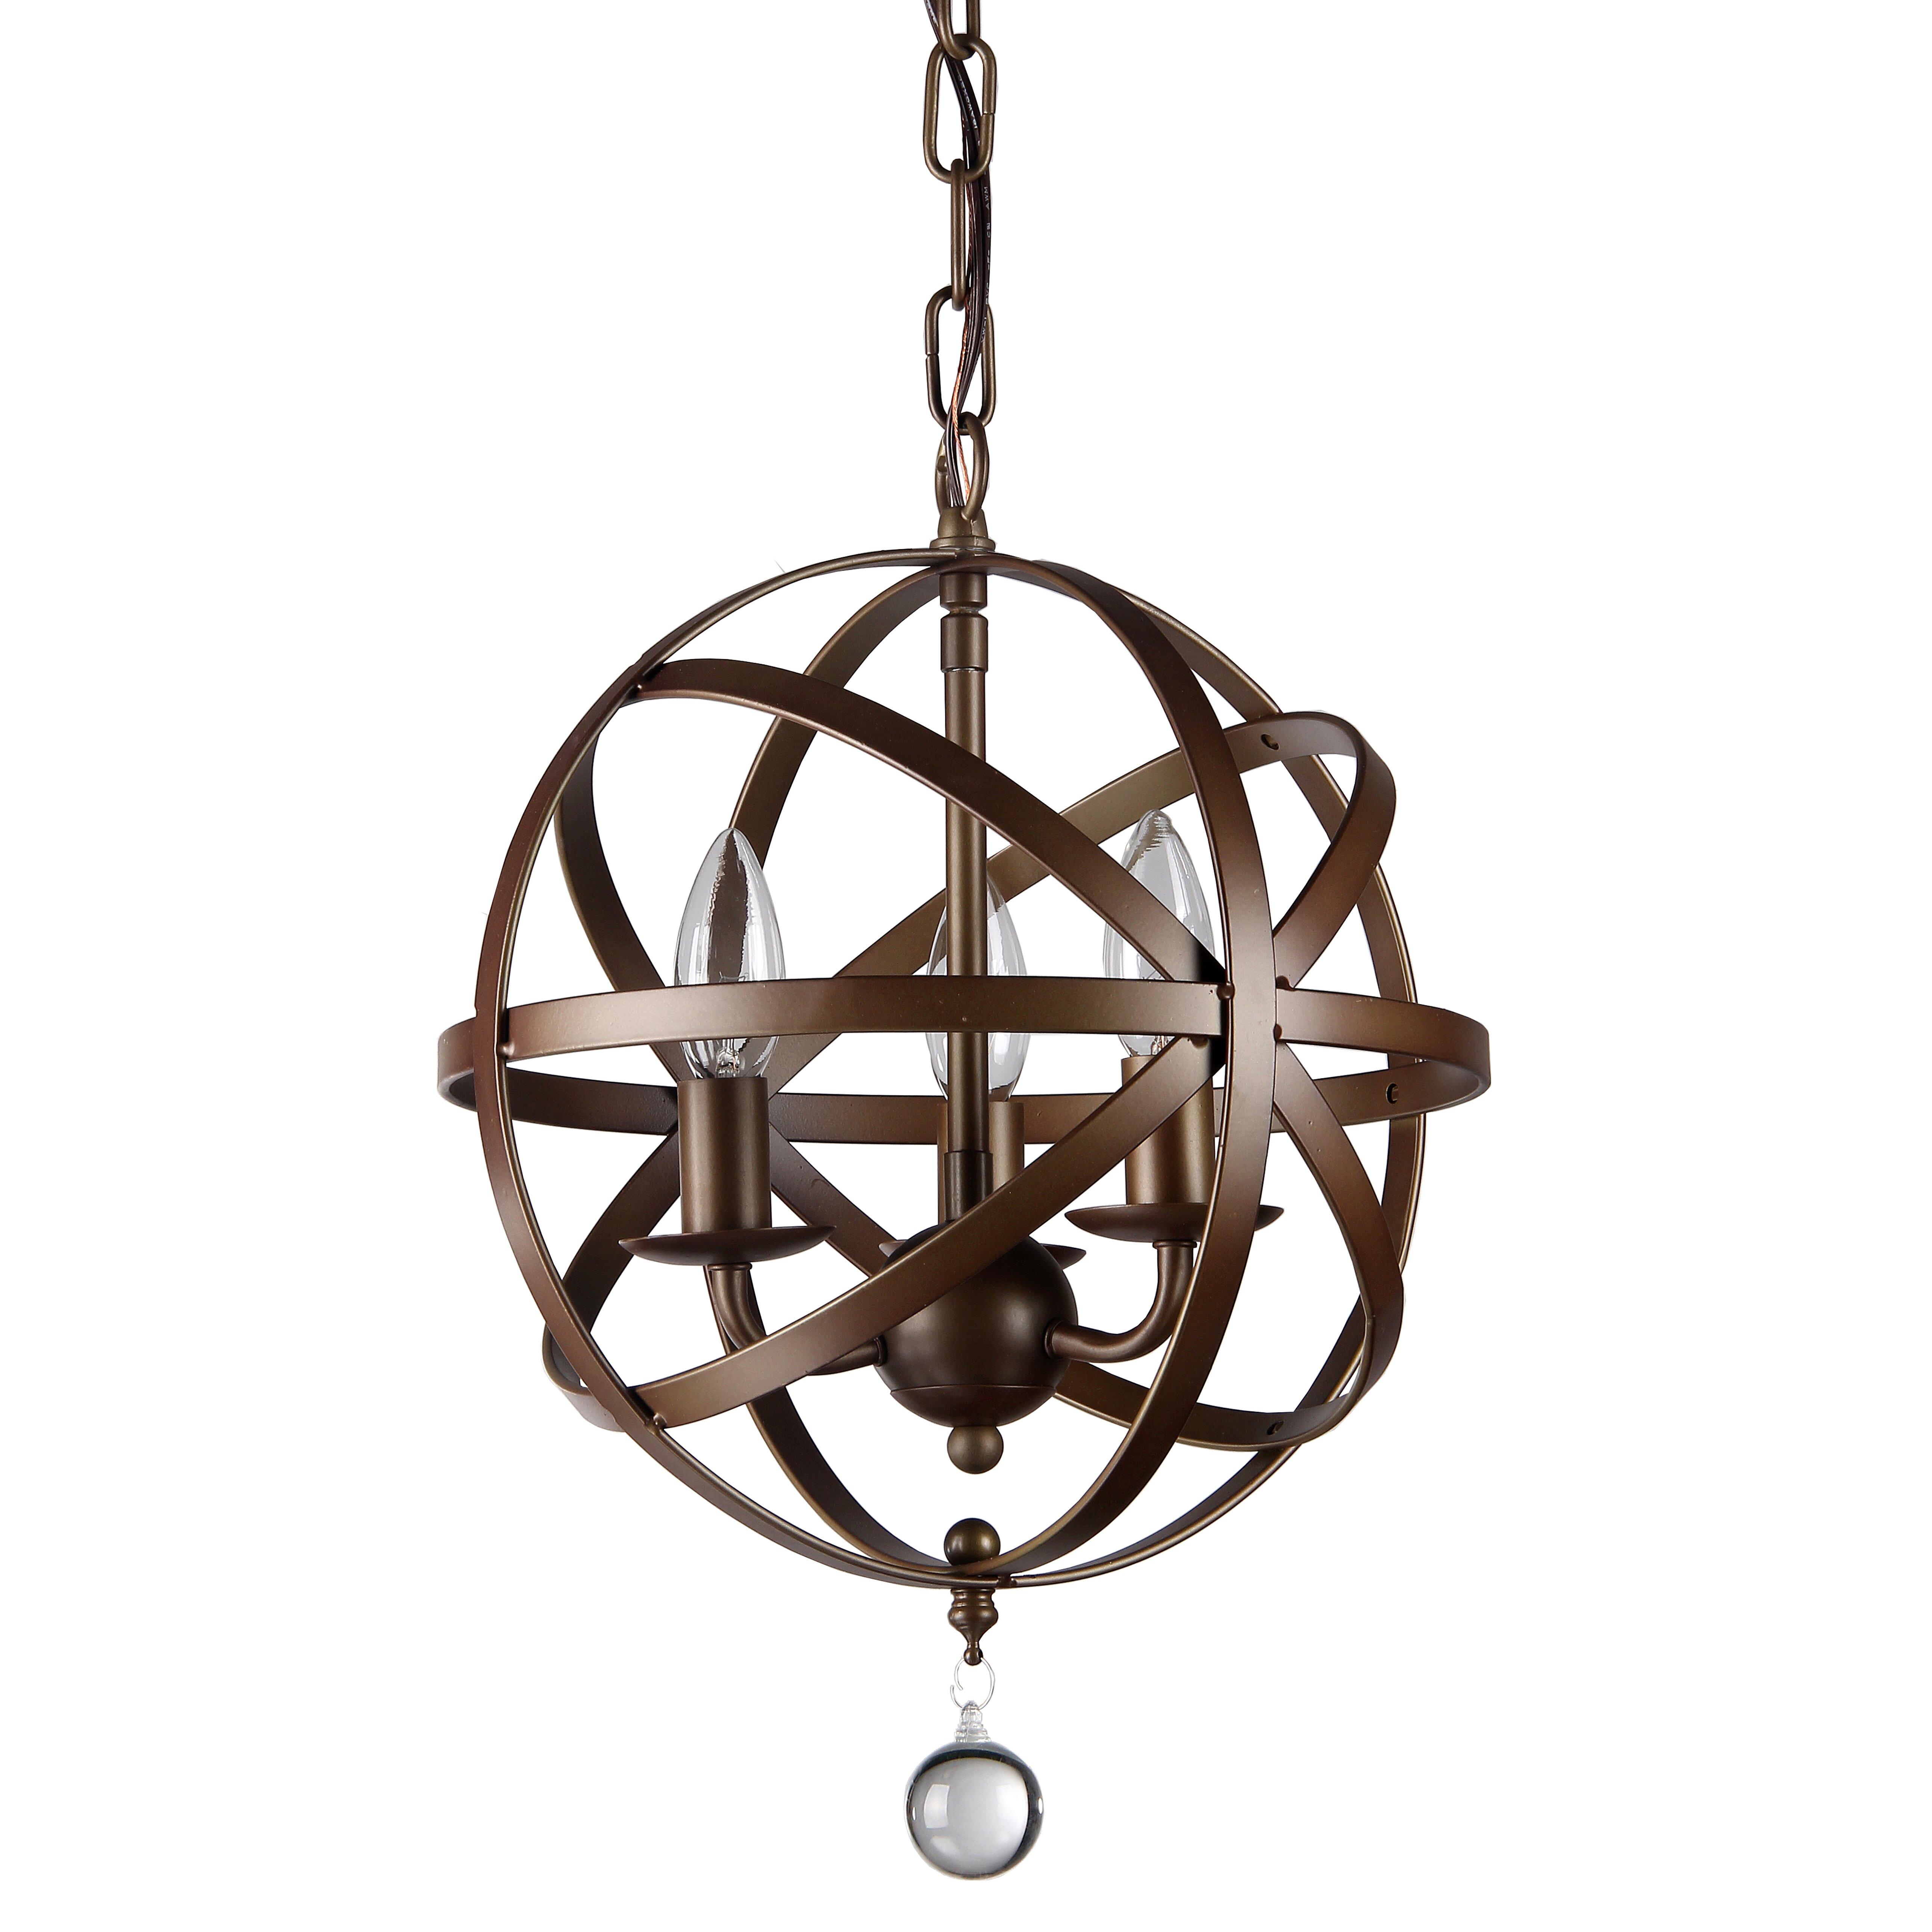 Foyer Lighting Tiffany Style : Warehouse of tiffany riza light foyer chandelier